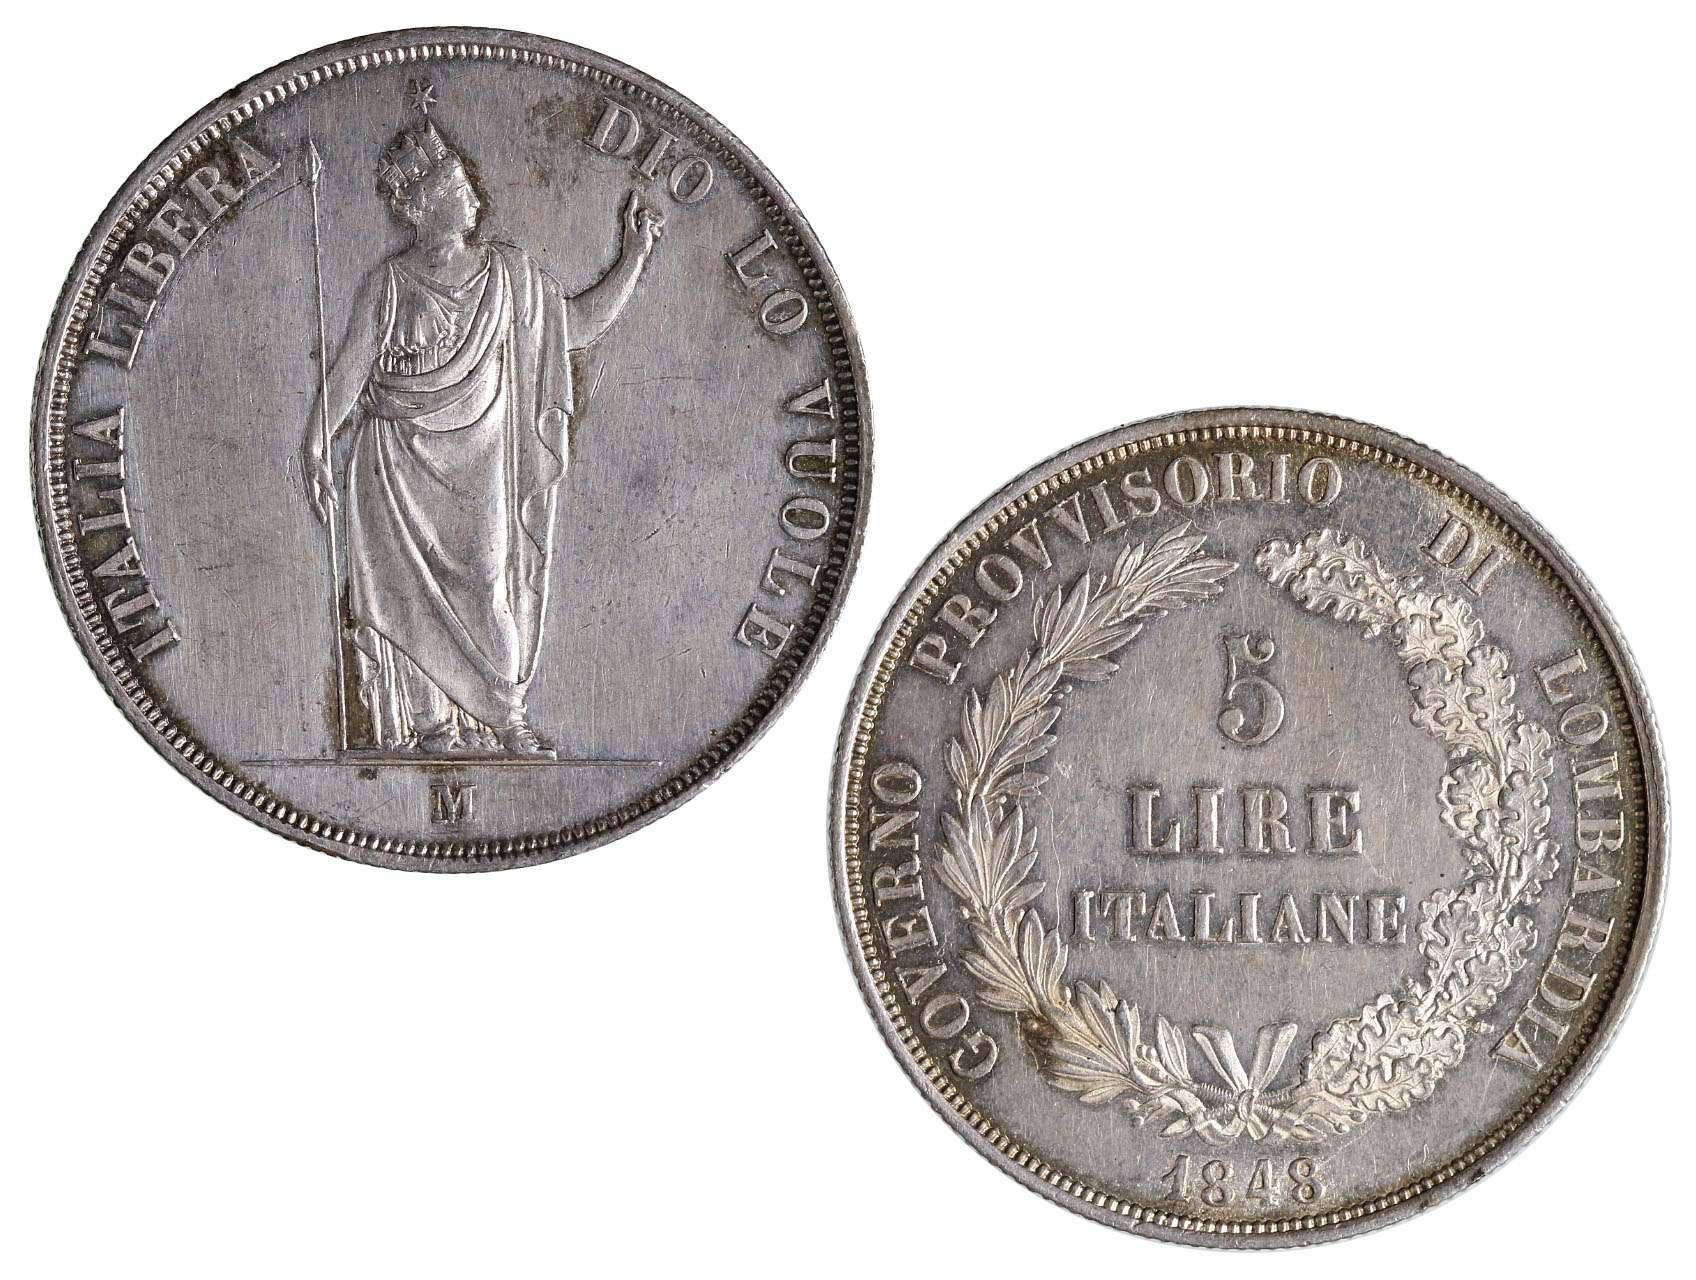 Ferdinand V 1835-1848 - 5 Lire 1848 M, N39a